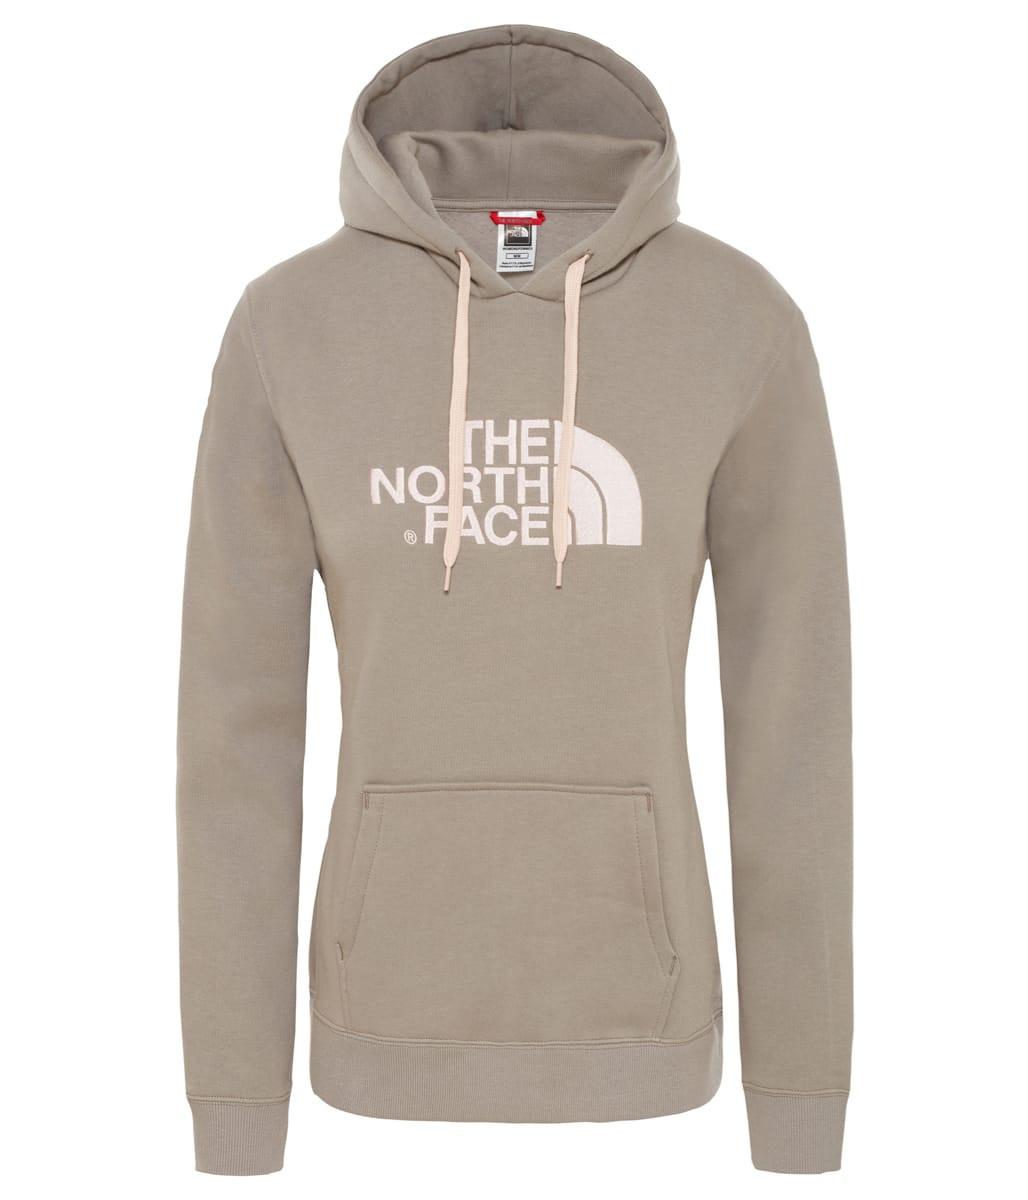 f1702206 ... The North Face Women's Drew Peak Pullover Hoodie Silt Grey ...